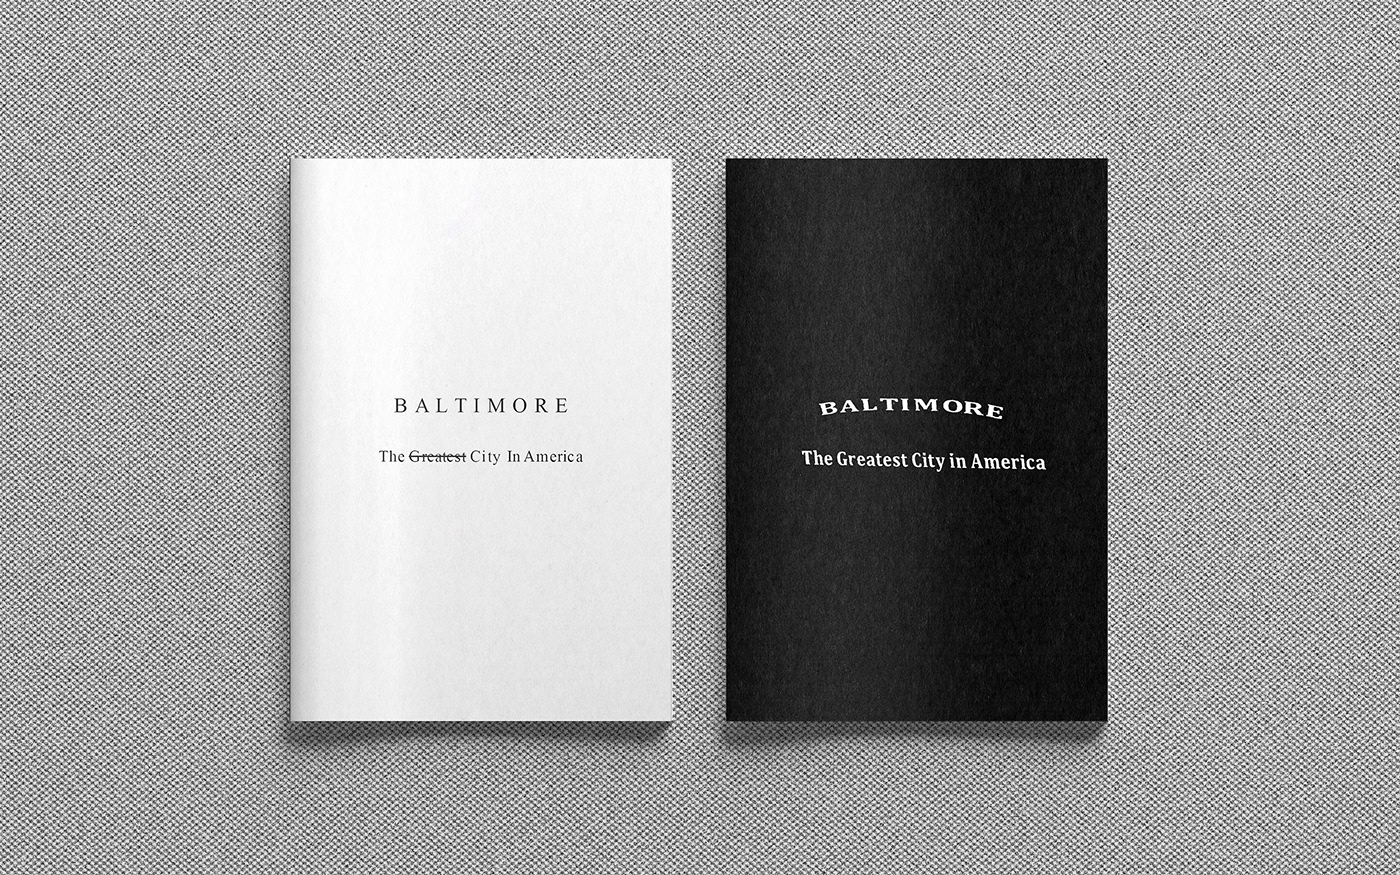 Baltimore BLM book capitalism Drugs editorial handmade Poverty usa Zine